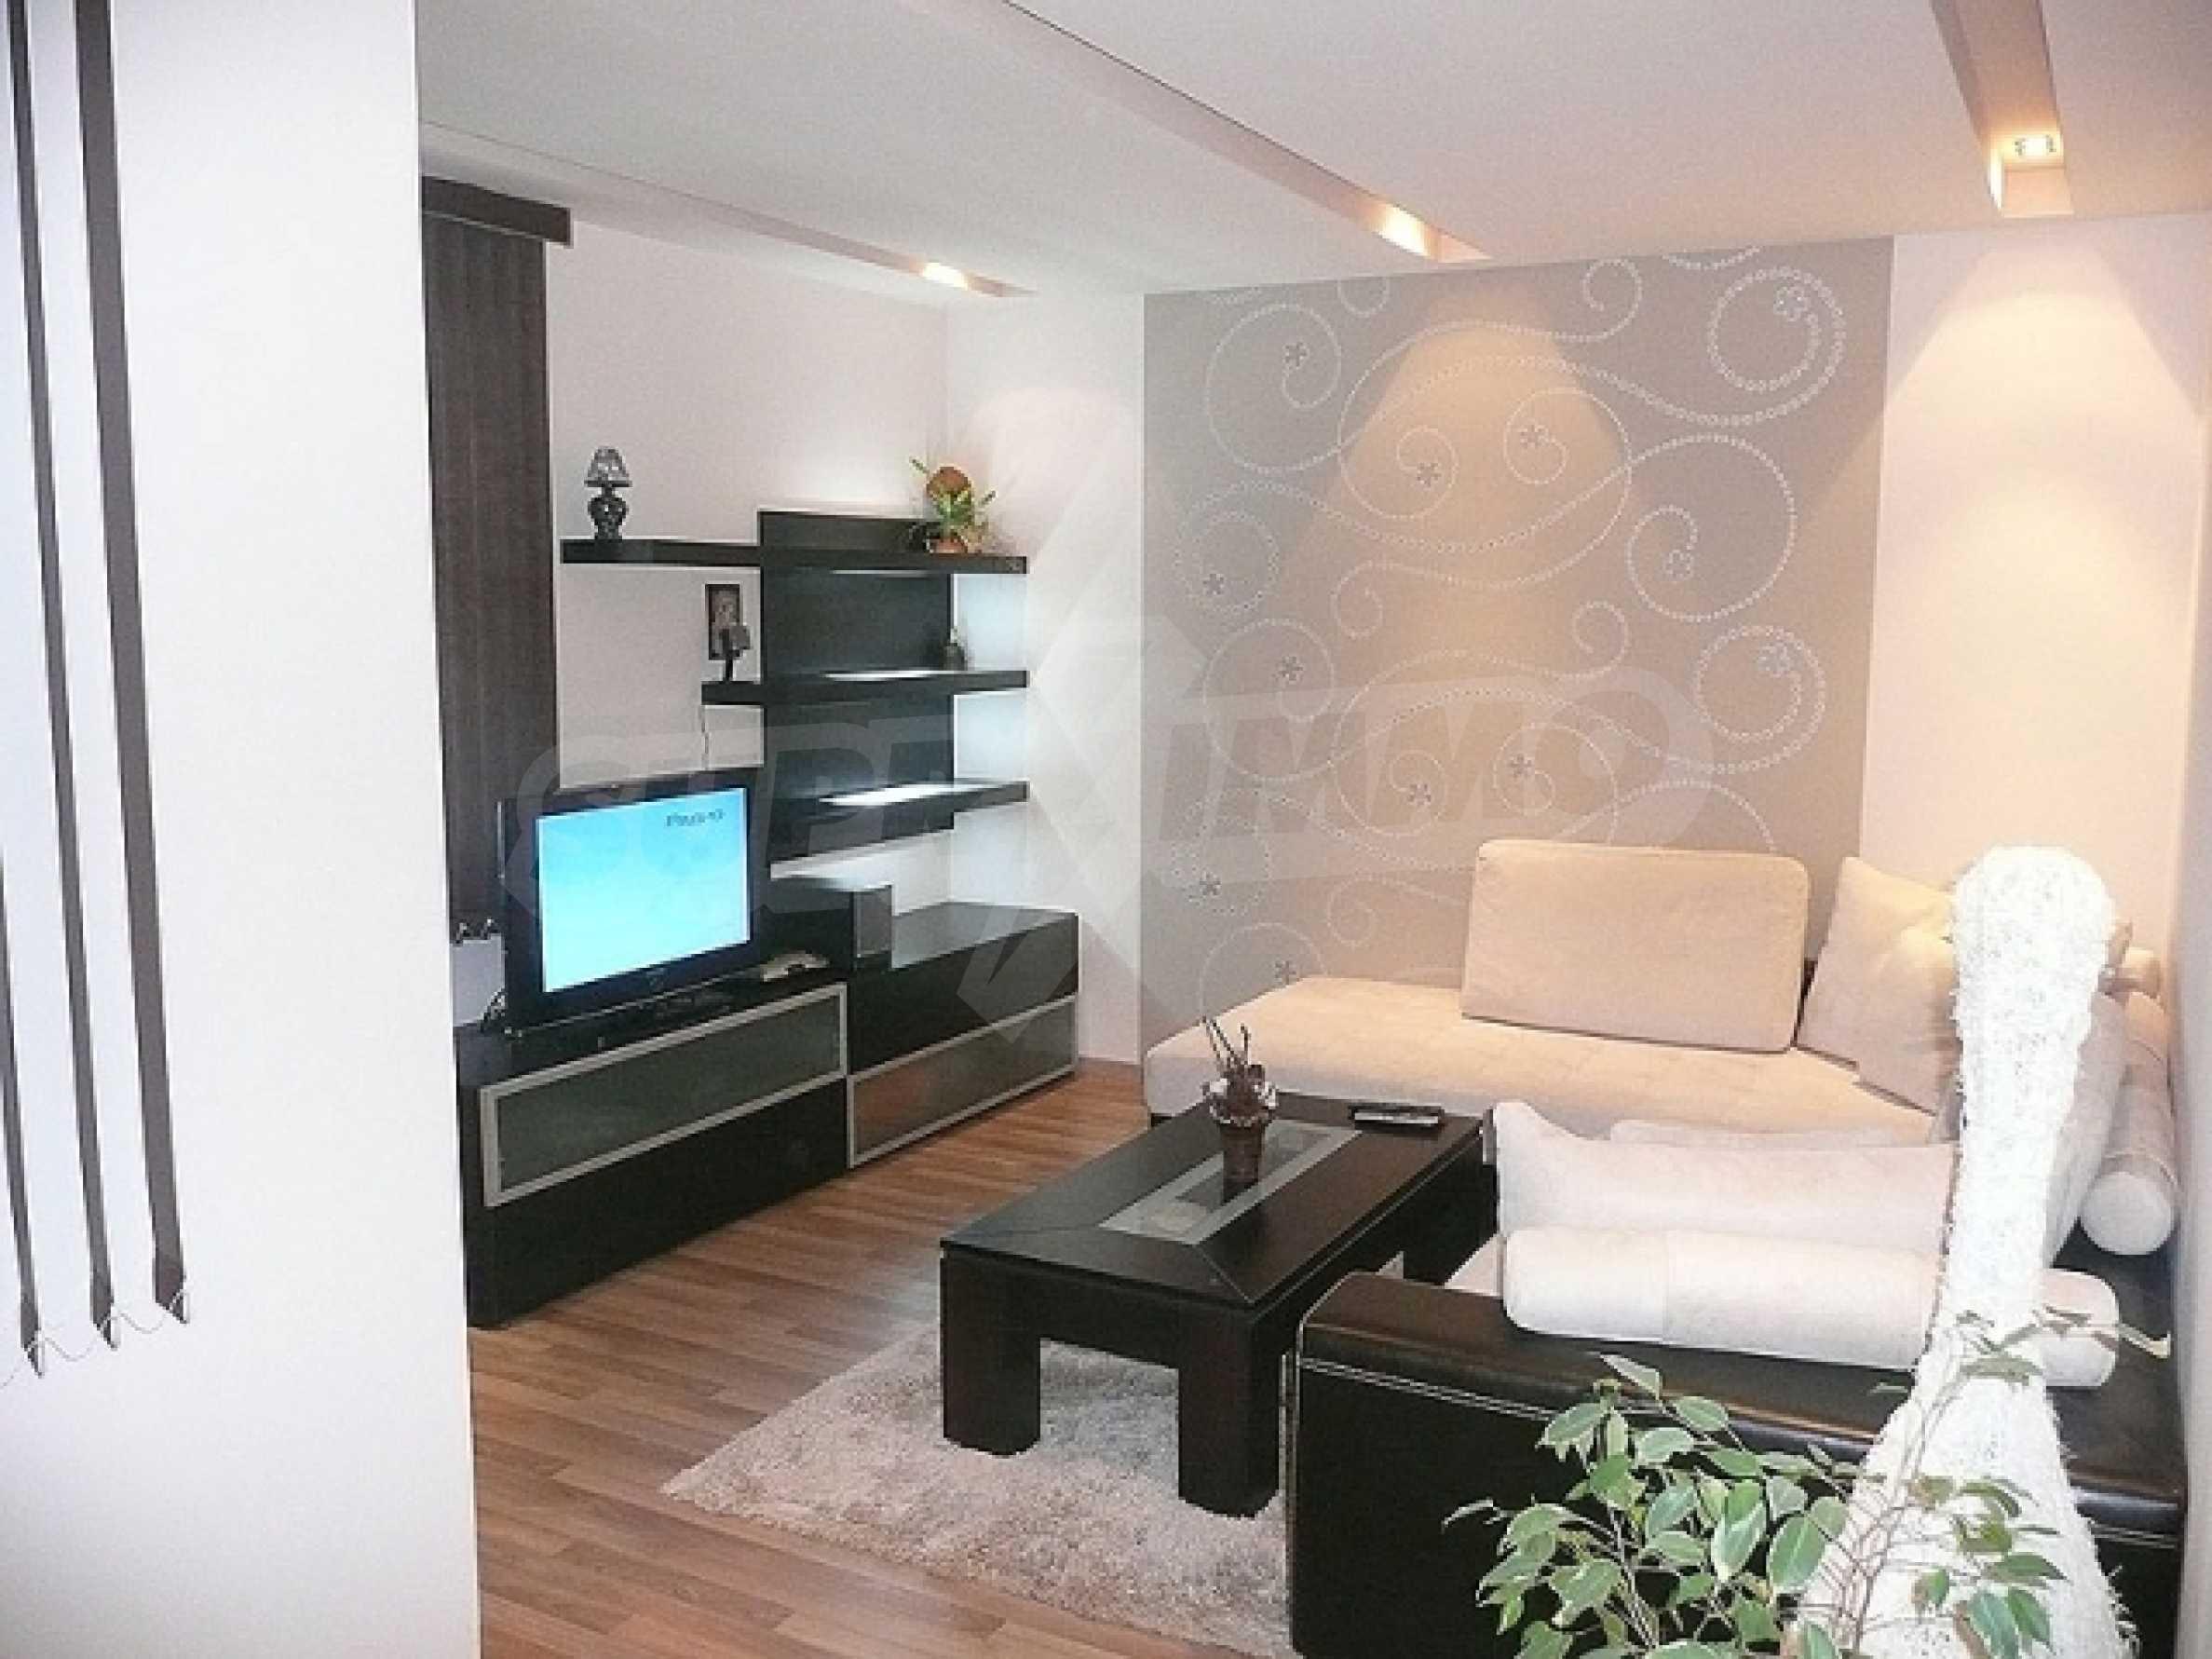 Wohnung in Priselski Klöstern 3